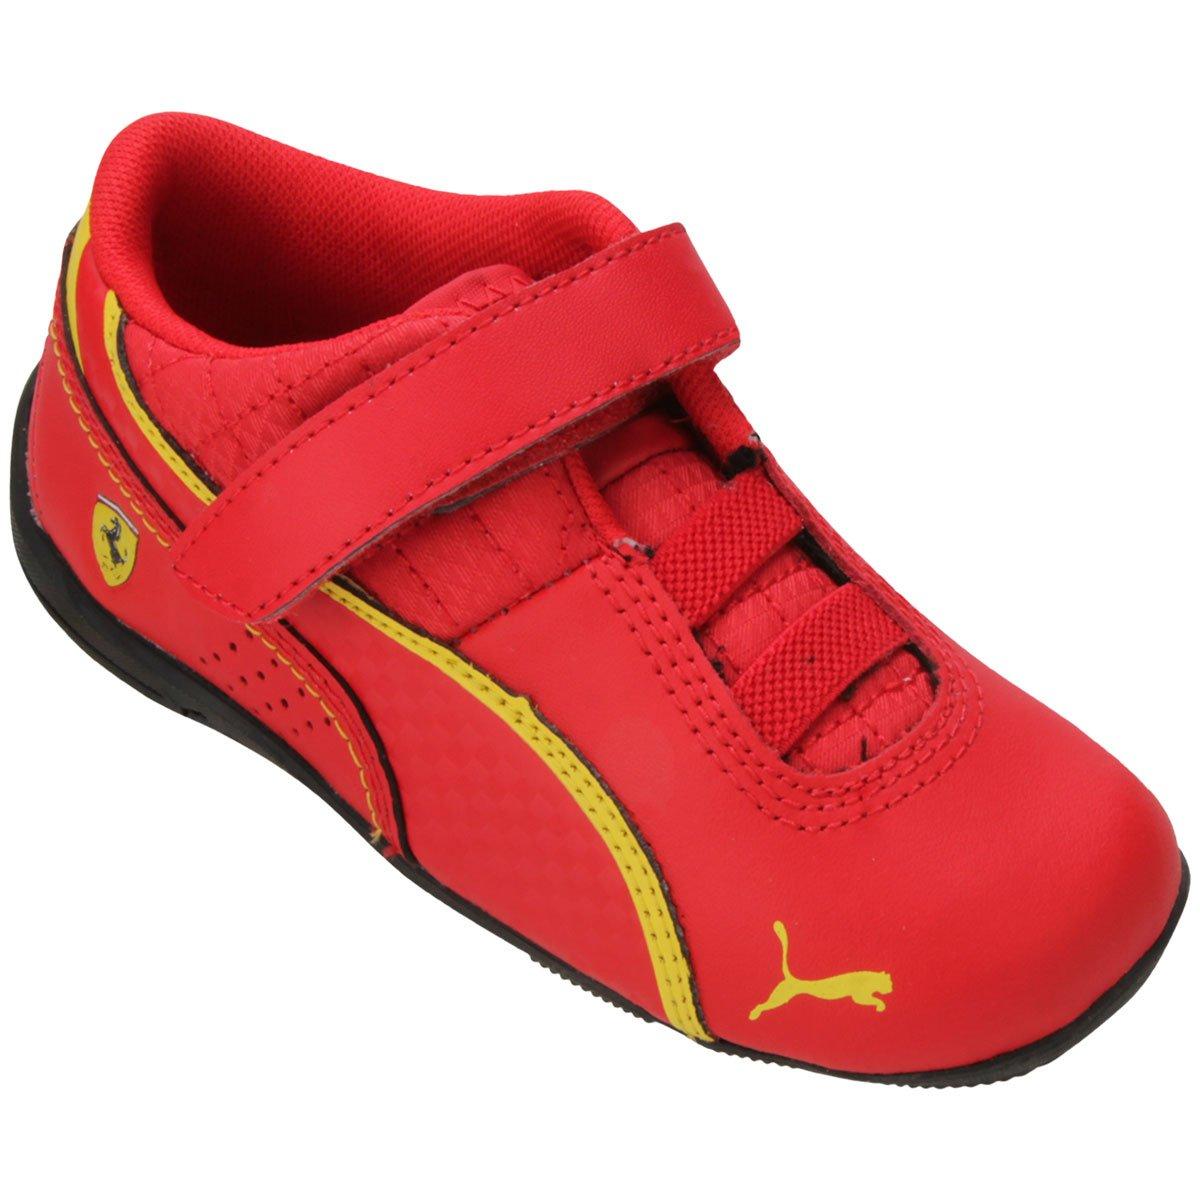 13f5a63ca15 ... germany tênis puma drift cat 6 l scuderia ferrari v infantil compre  agora netshoes 1d639 09576